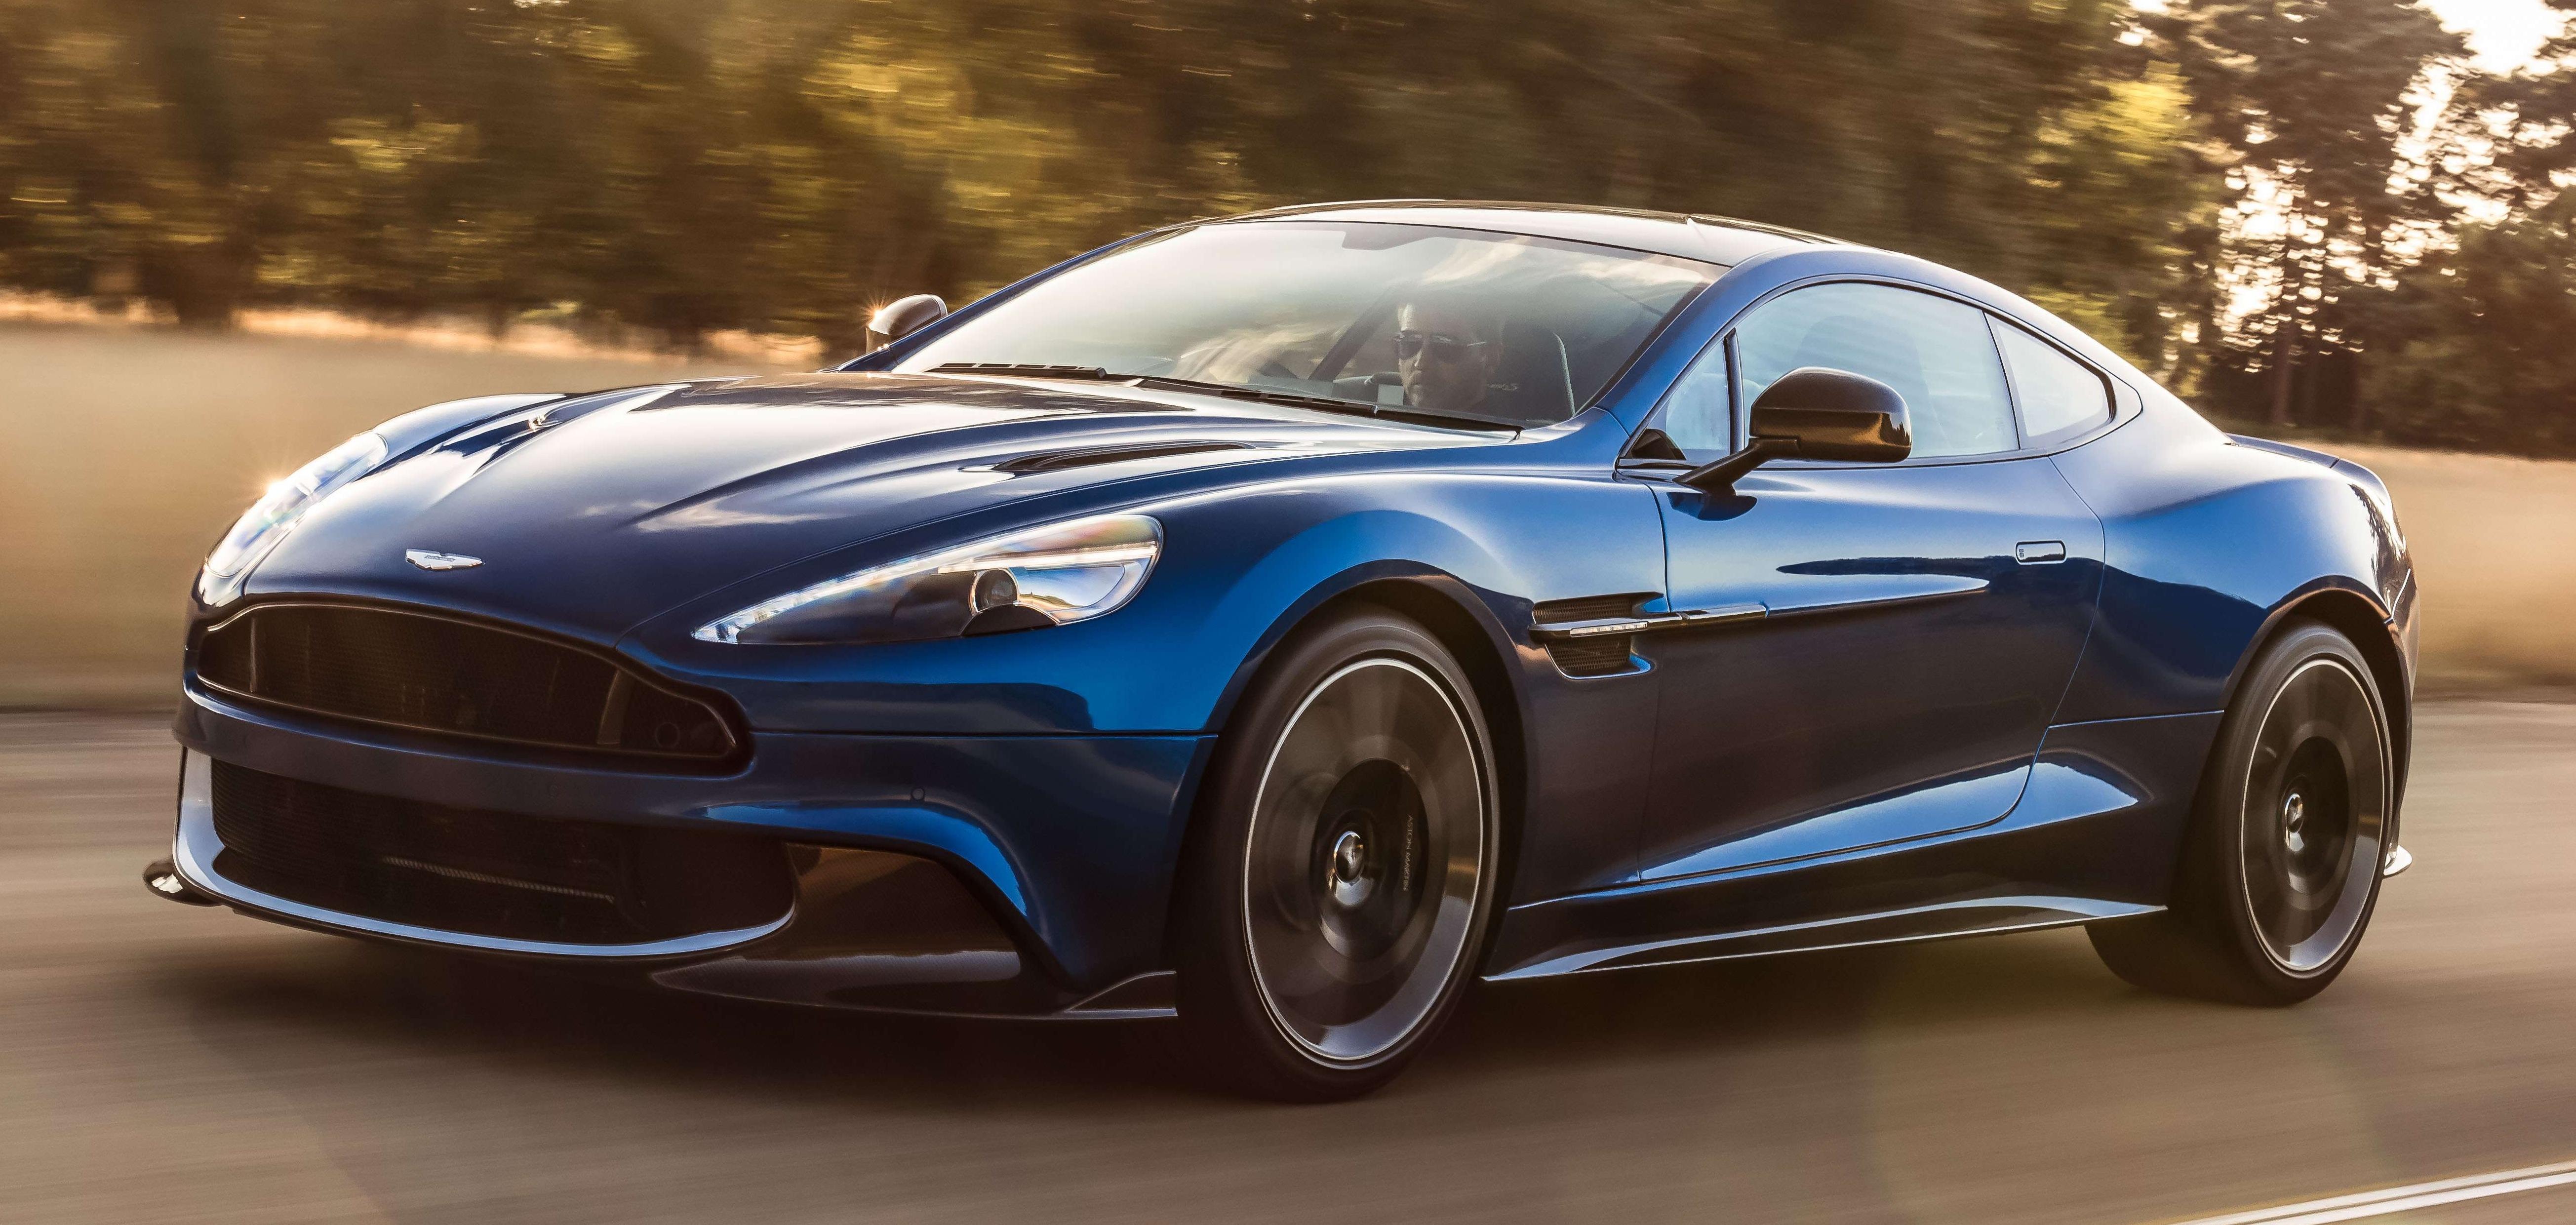 Aston Martin Vanquish S Long Live The V12 Engine Image